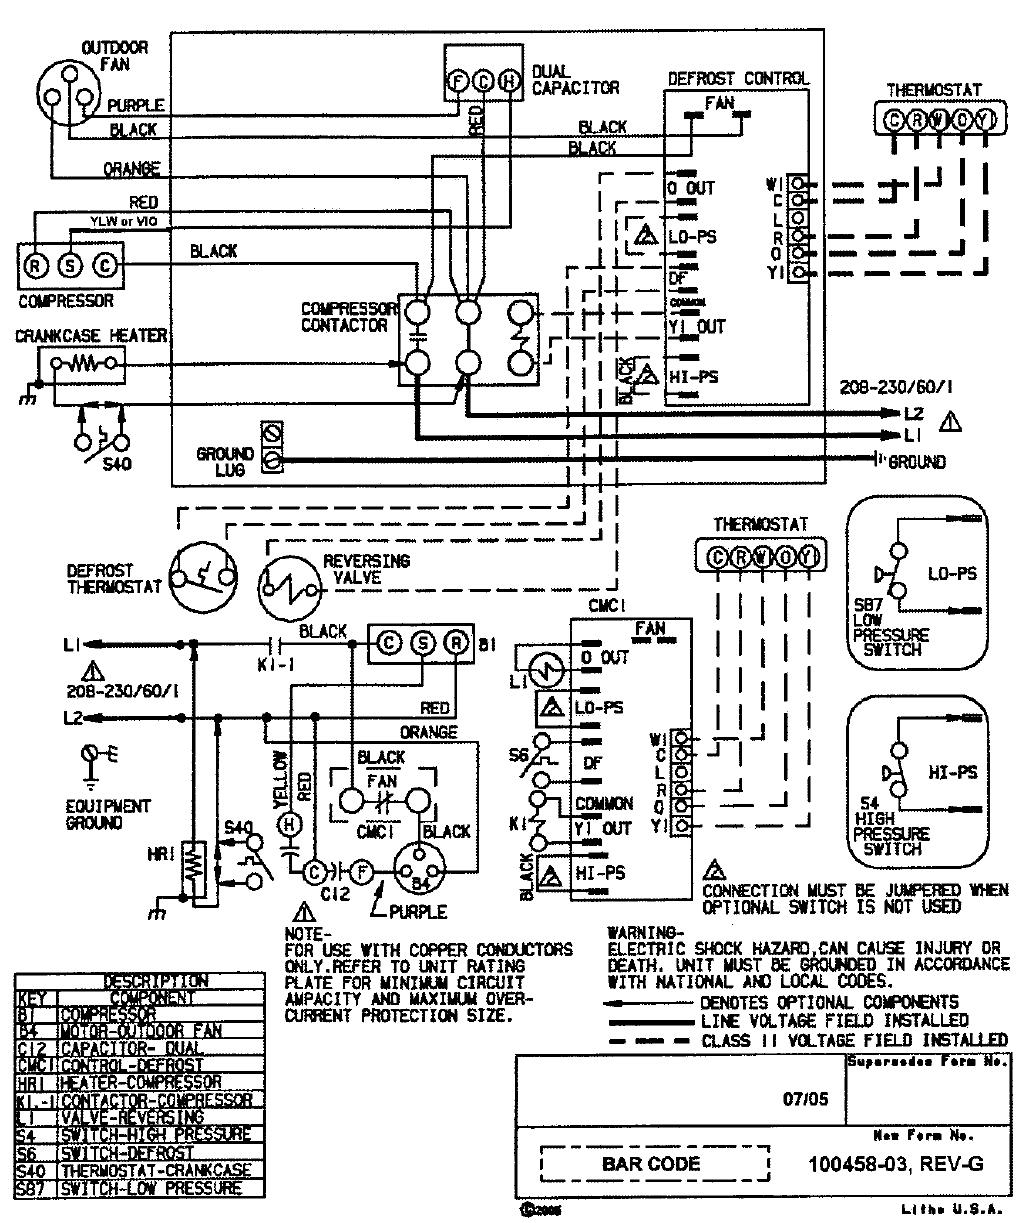 hight resolution of ducane heat pump wiring diagram armstrong heat pump wiring diagram throughout ducane 8i